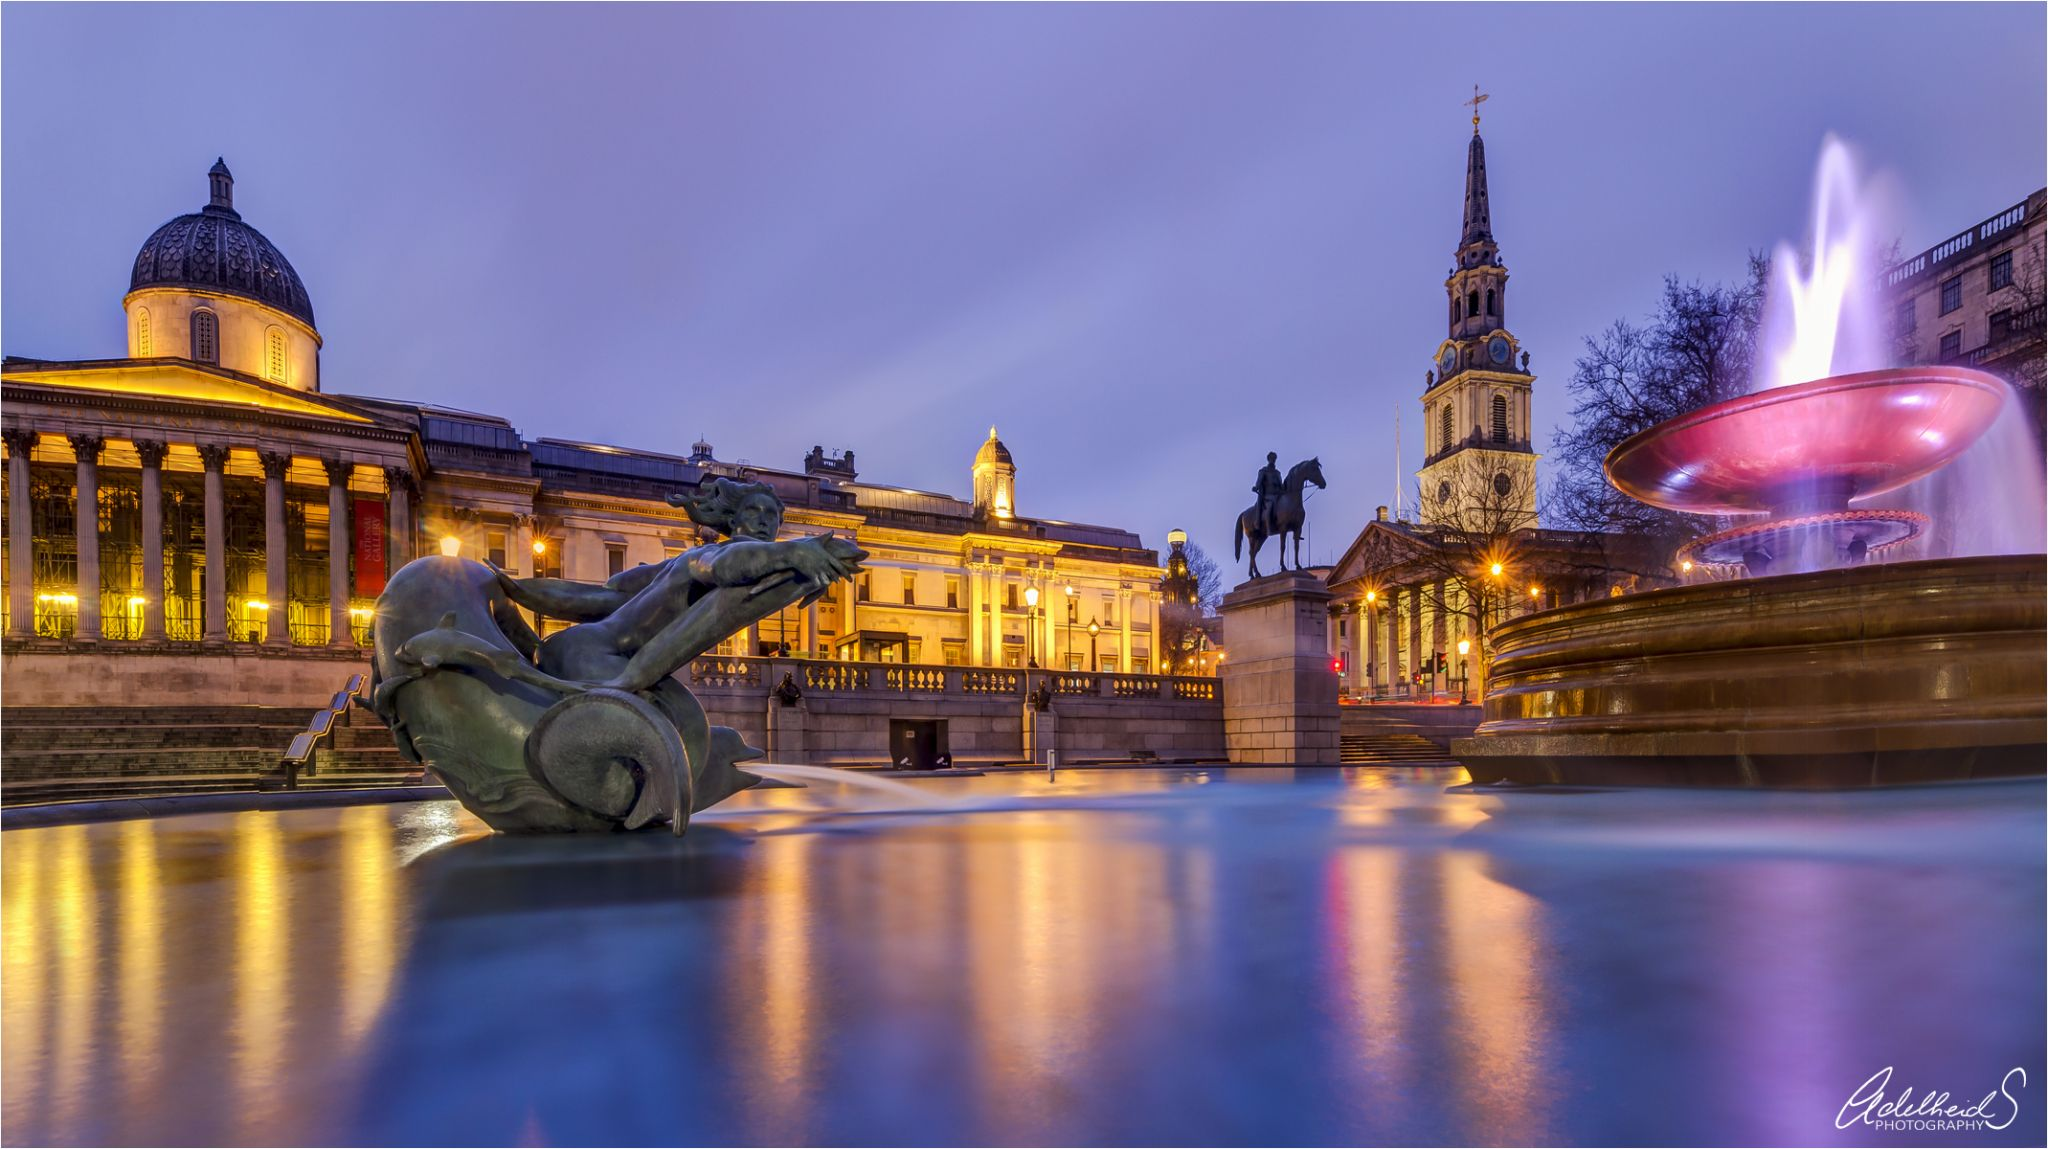 Trafalgar Square, United Kingdom